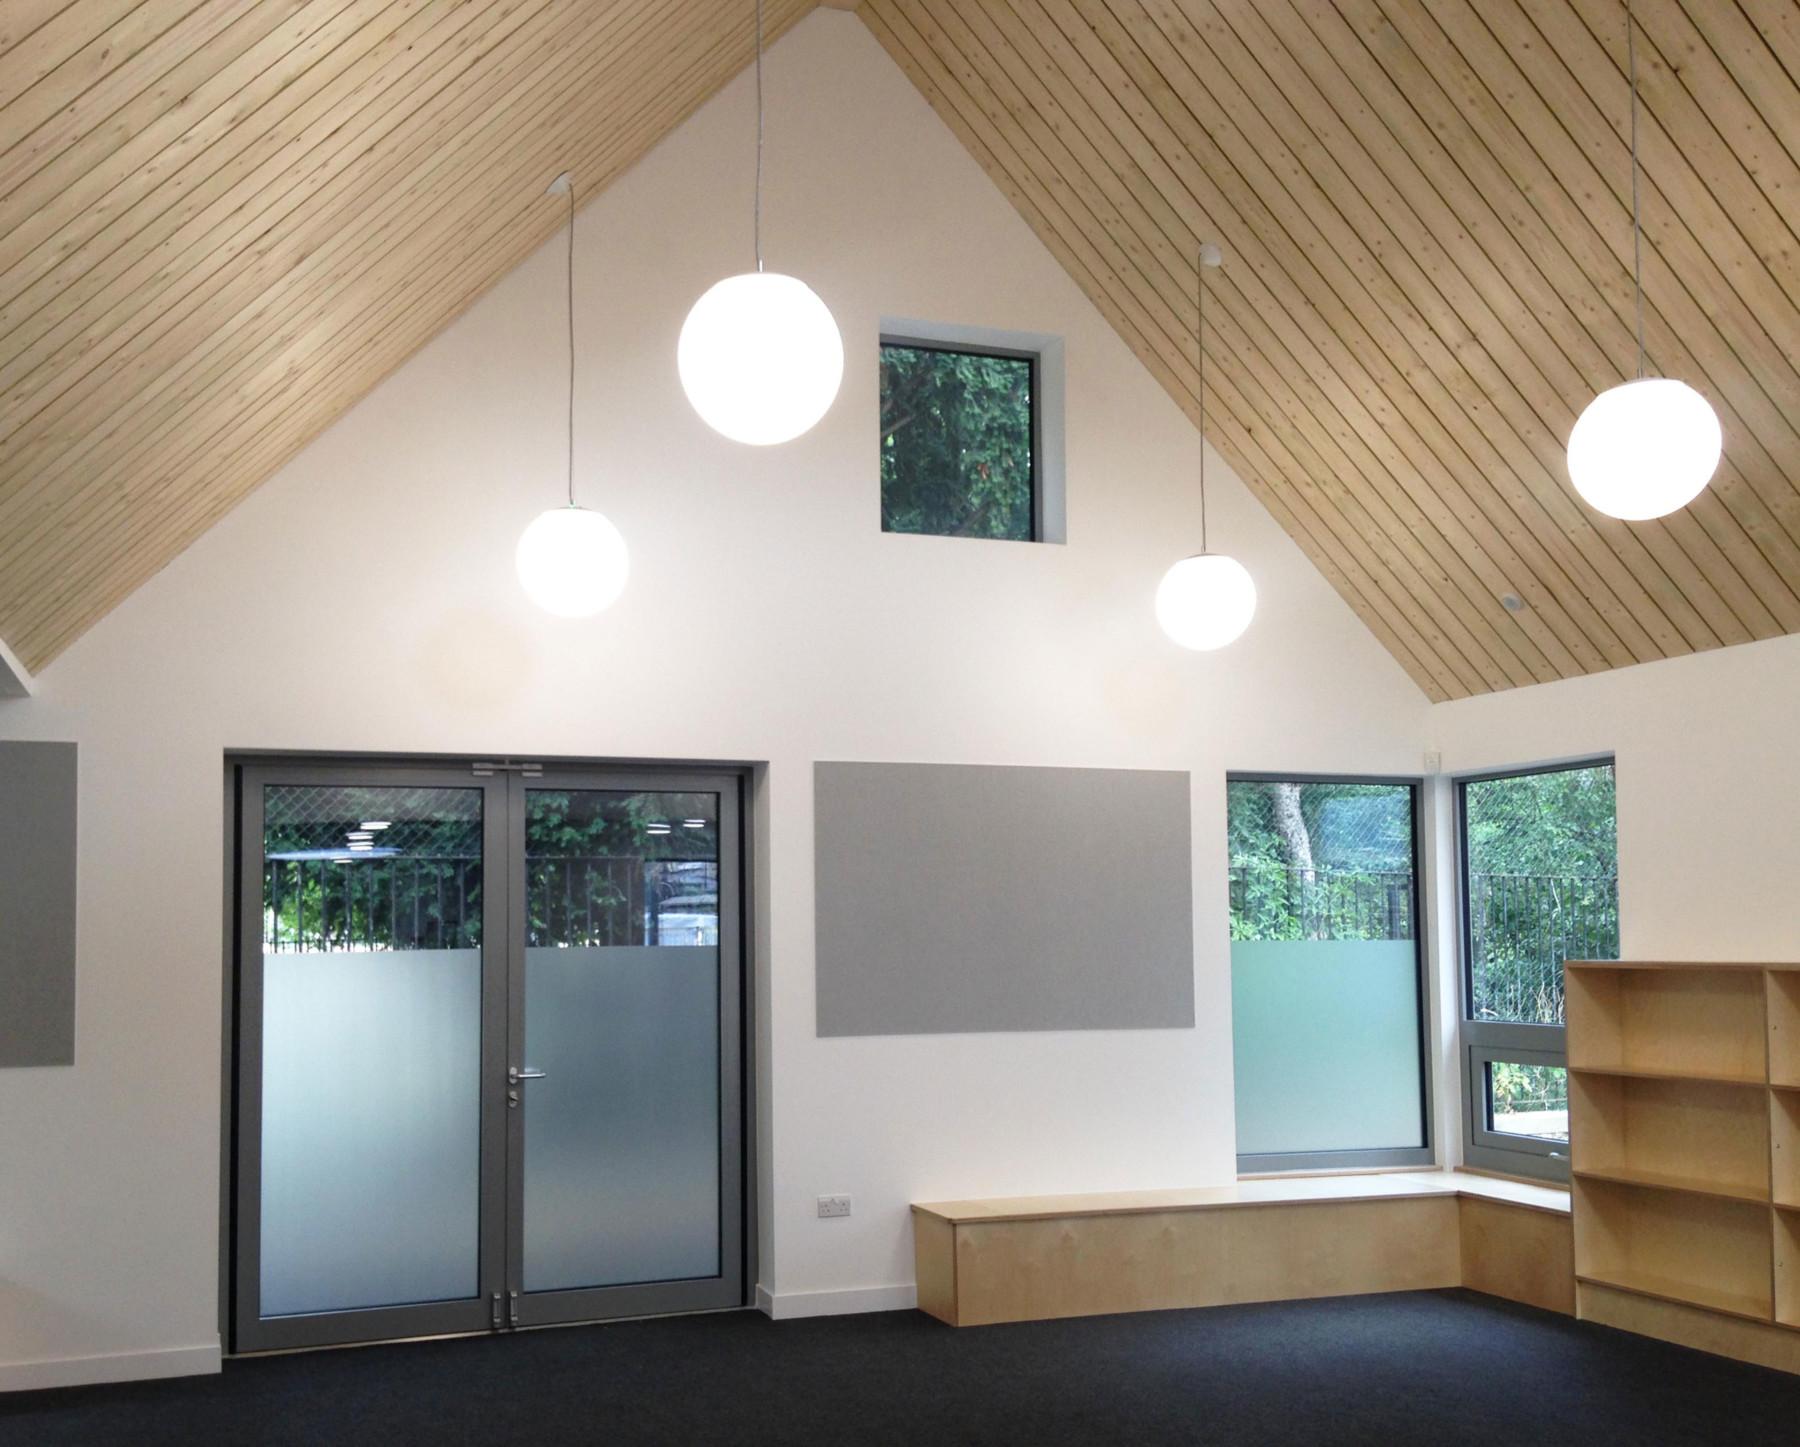 Sarah-Wigglesworth-Architects Kingsgate School library 3600